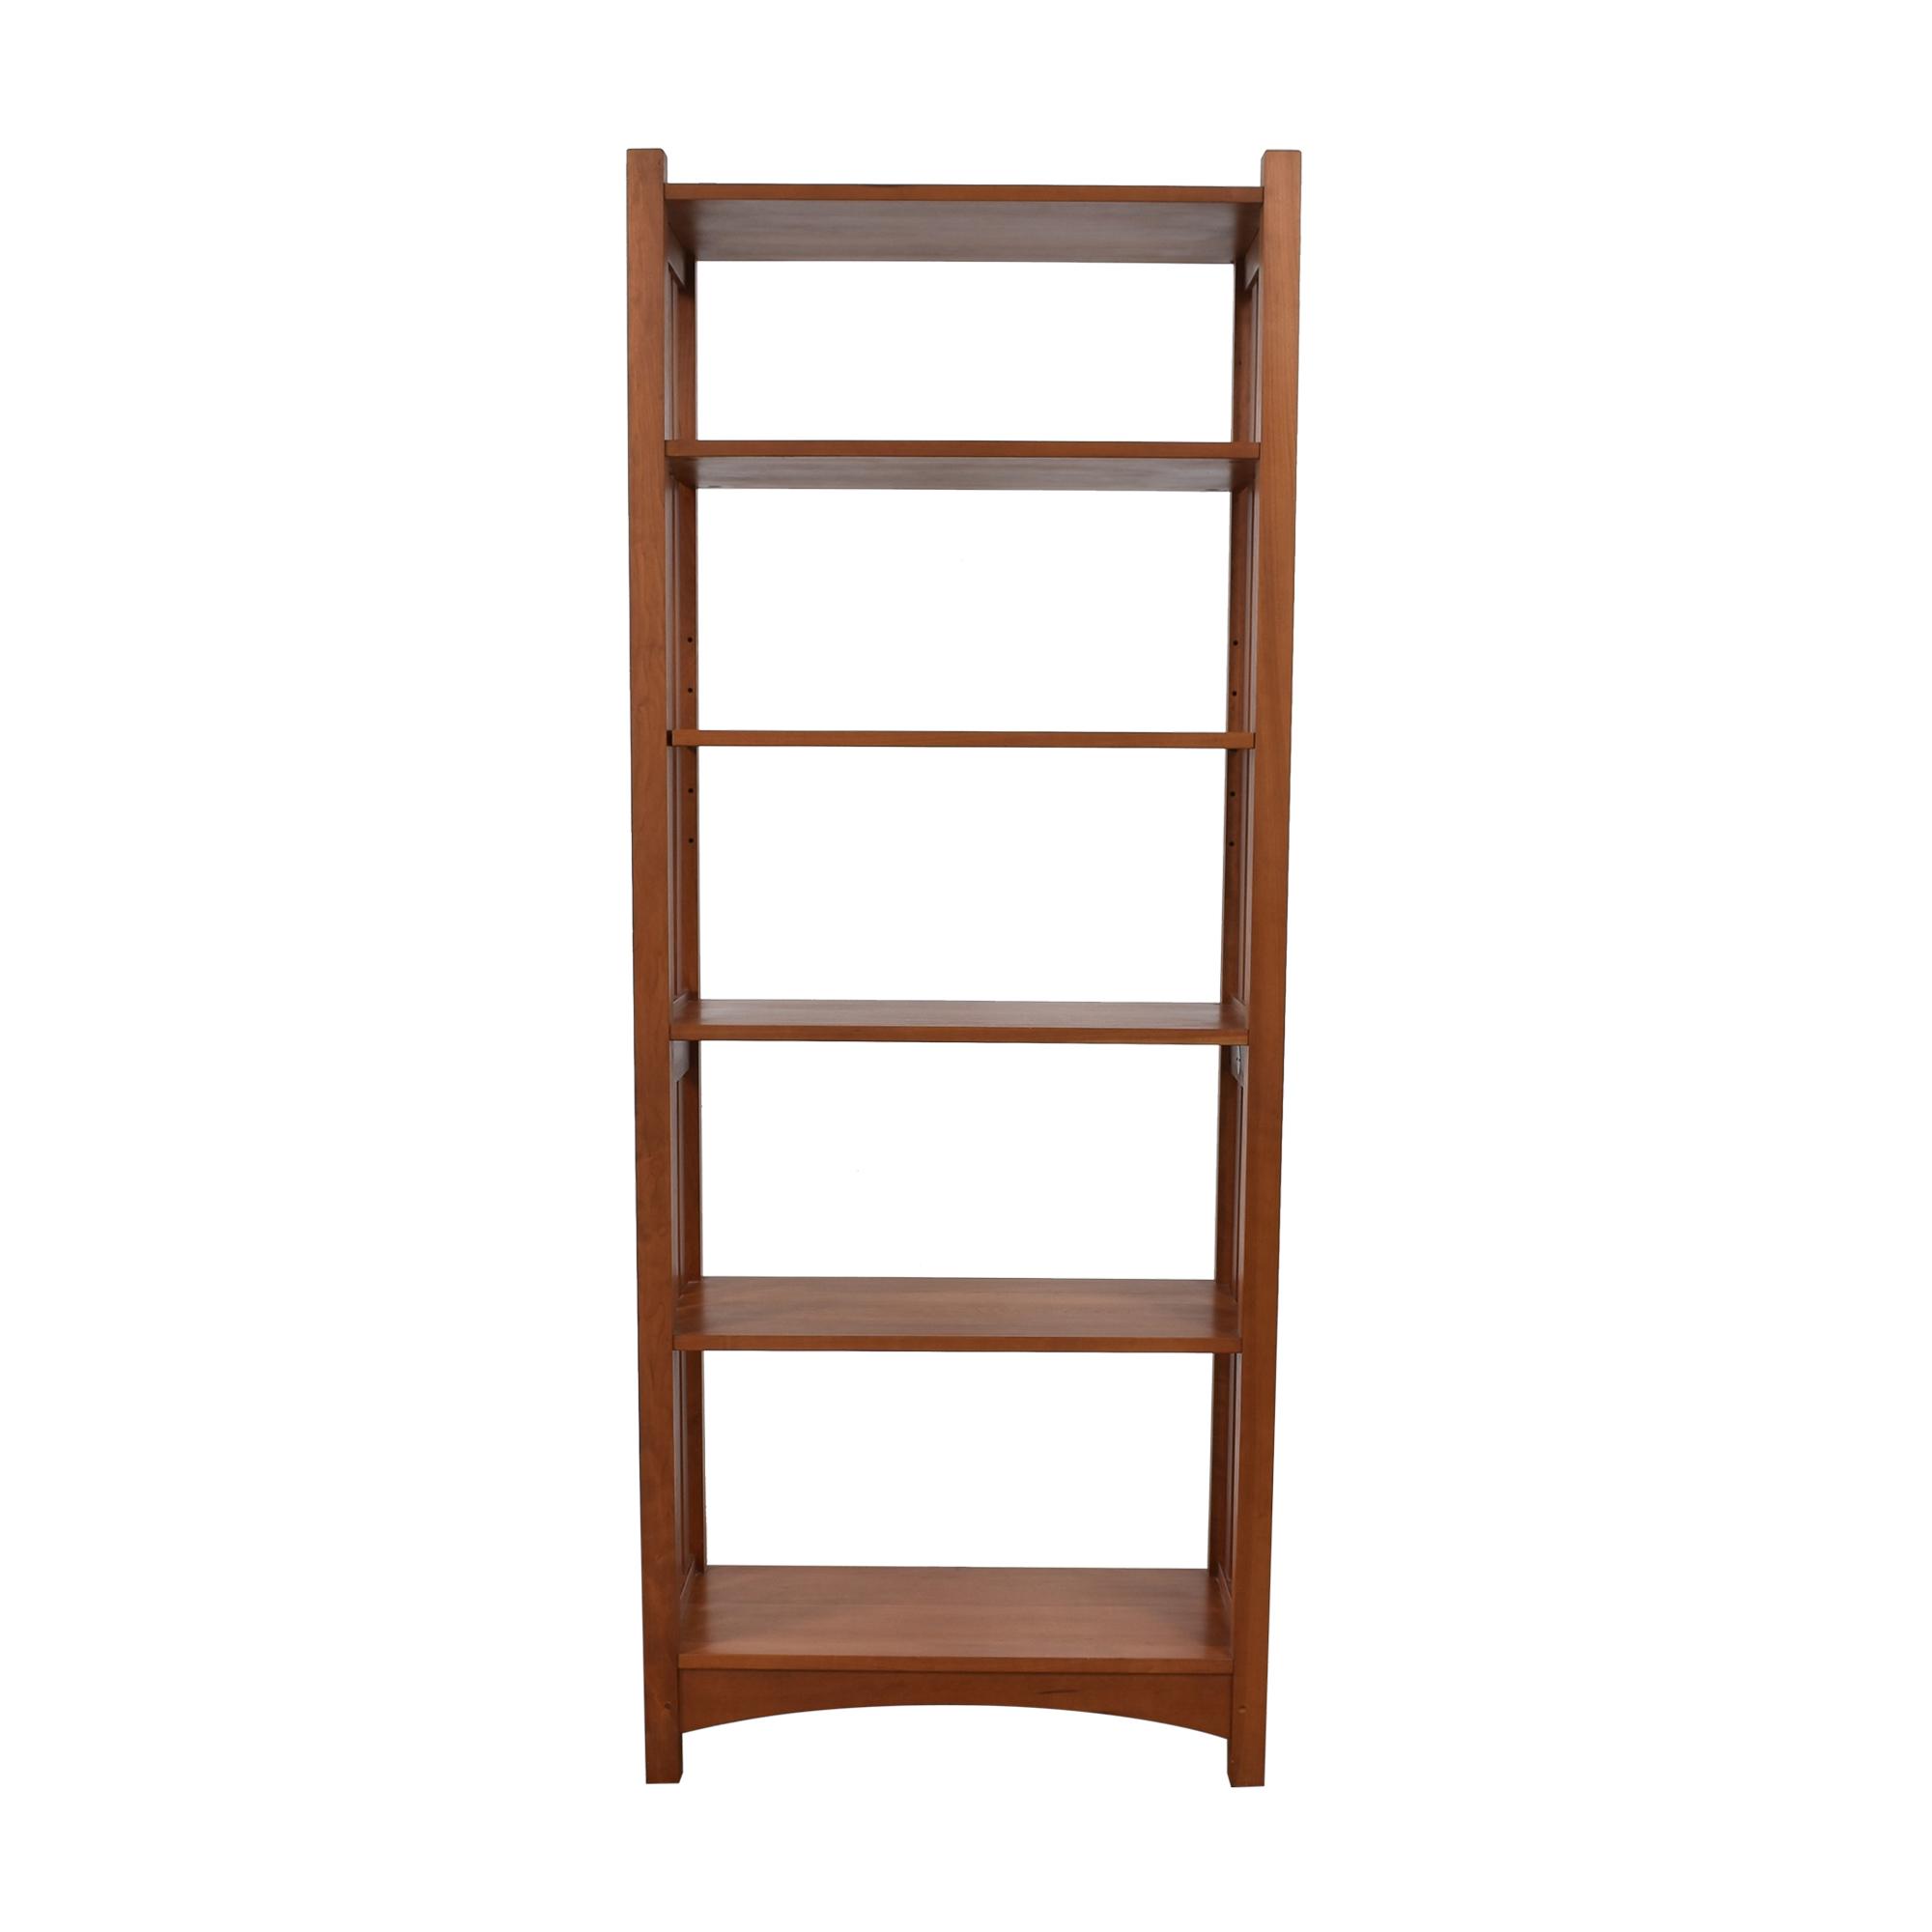 Stickley Furniture Stickley Mission Collection Open Bookcase ma